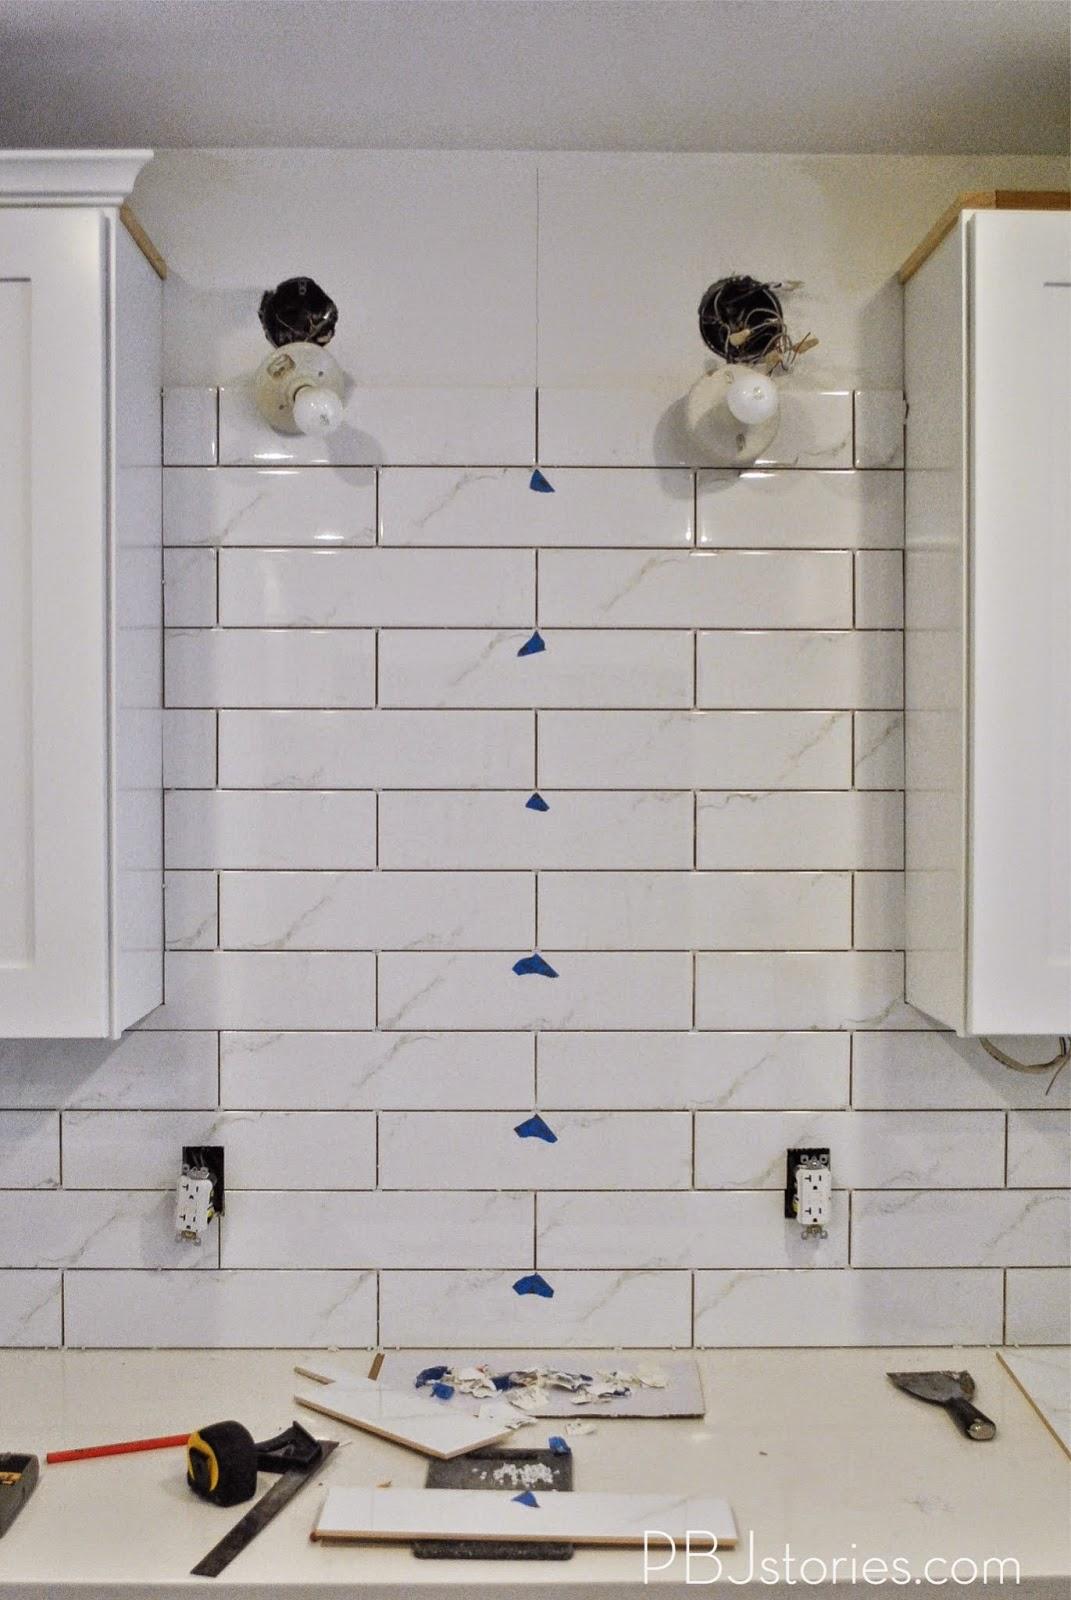 Grouting Kitchen Tile Flooring